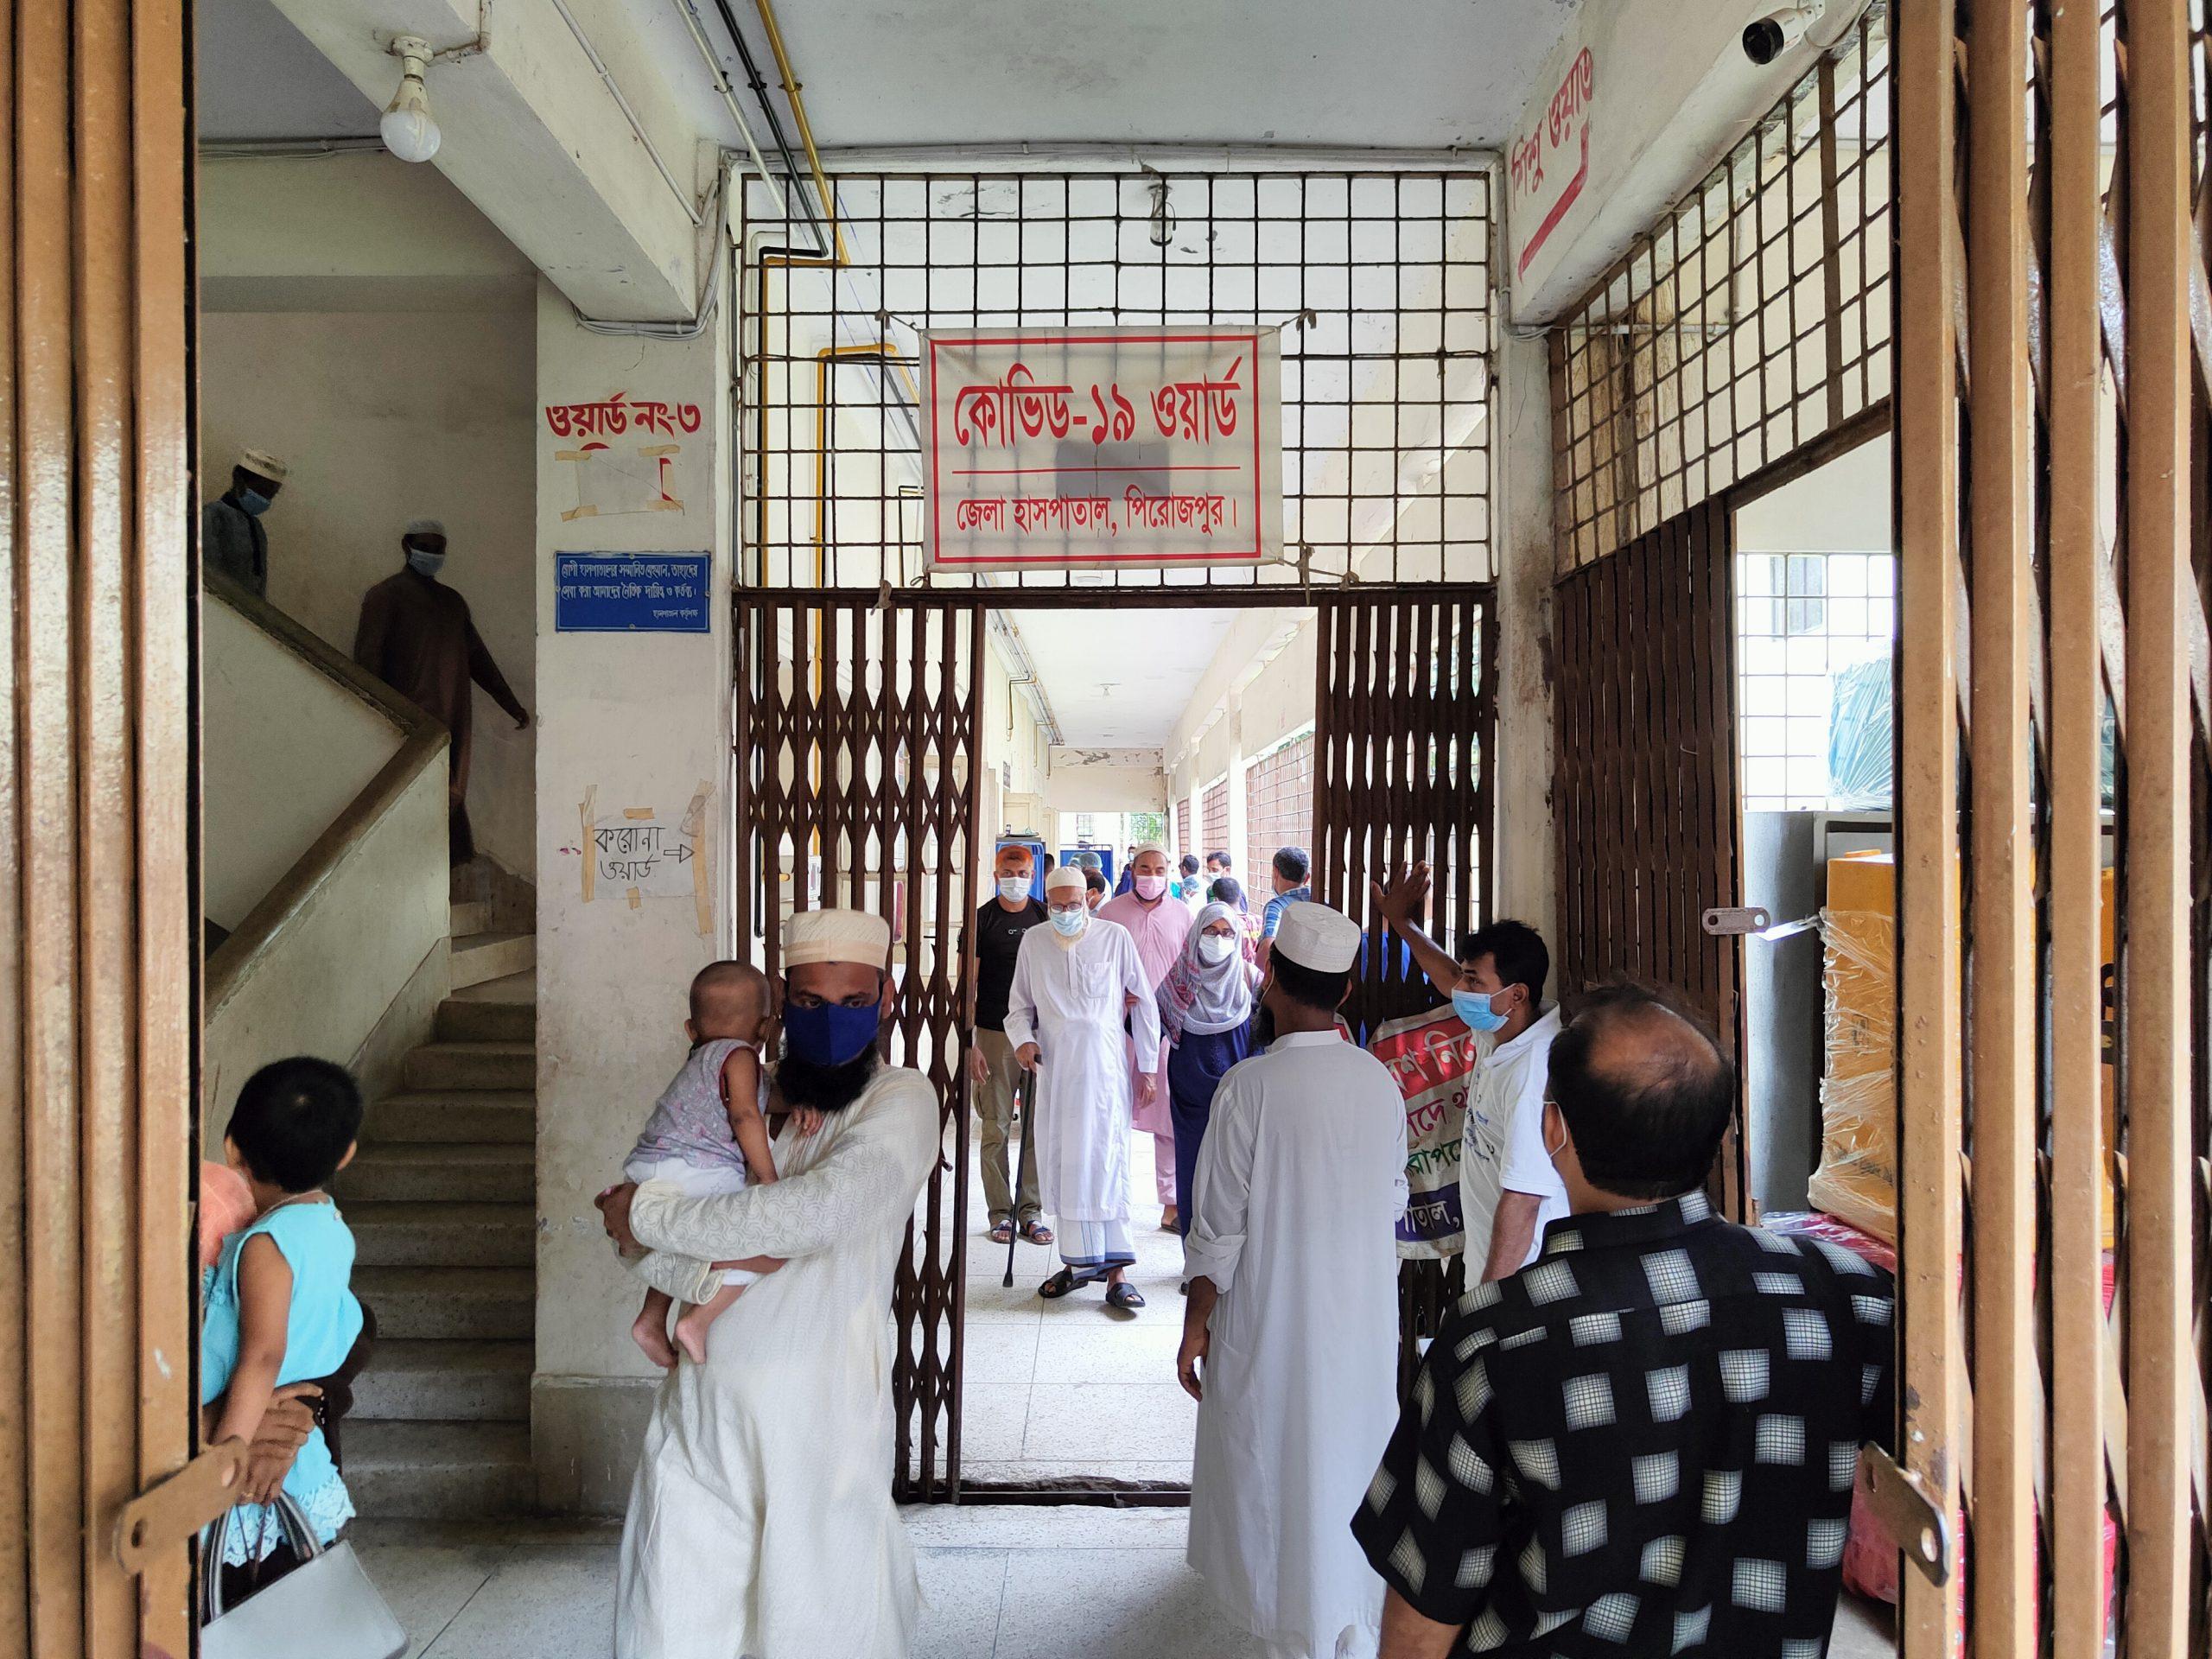 Photo of পিরোজপুরে ২৪ ঘন্টায় ৫ জনের মৃত্যু, হাসপাতালে ভর্তি ৬২ জন